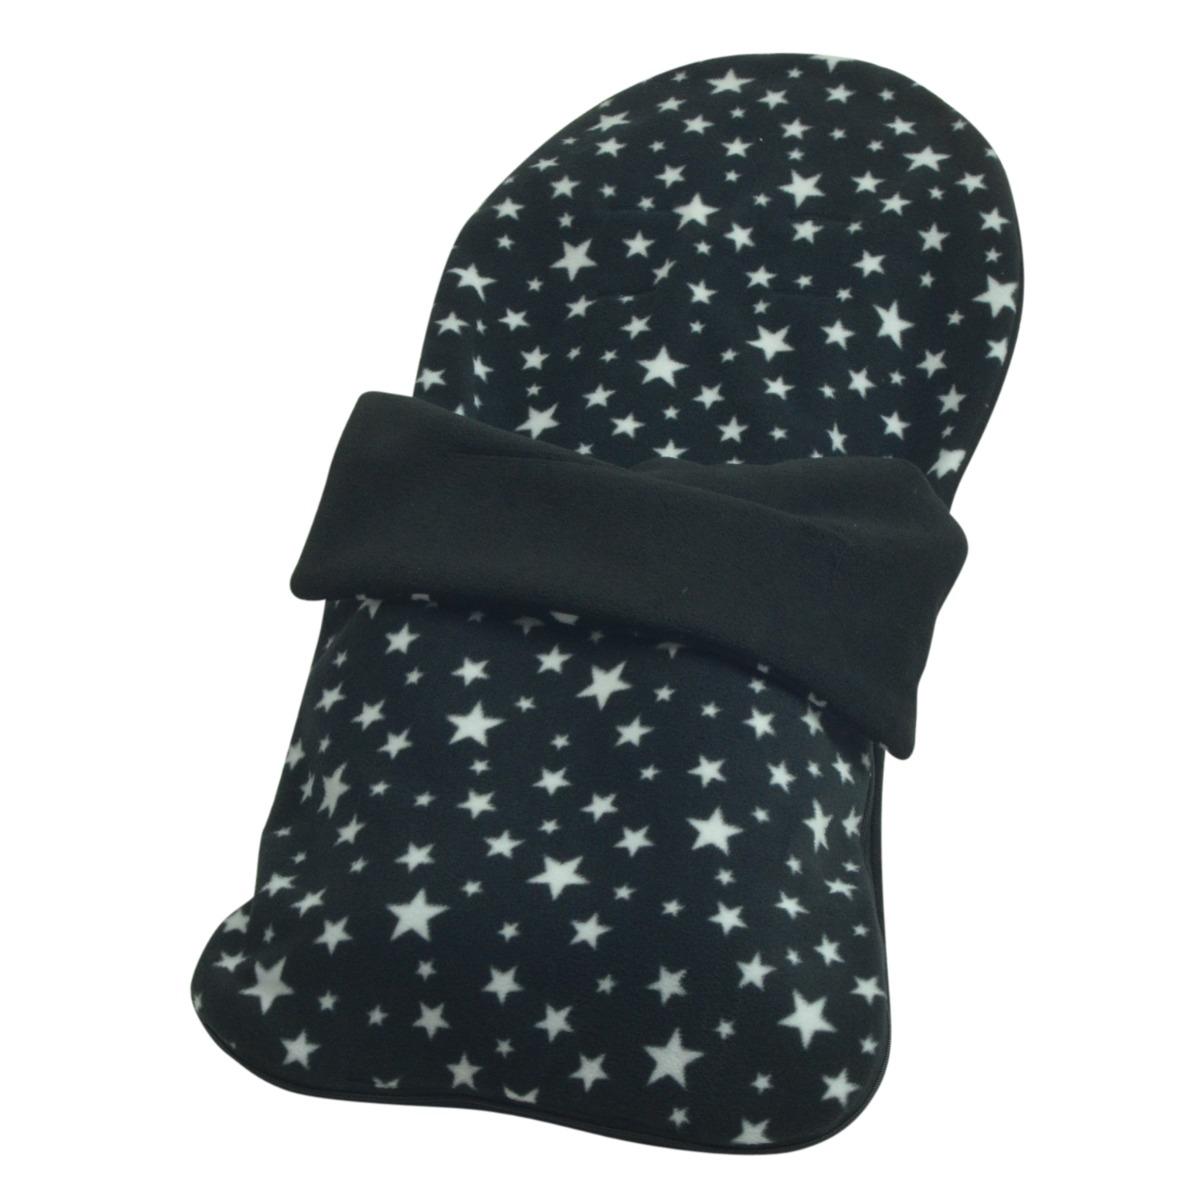 Snuggle Summer Footmuff Compatible With Mutsy Evo Grey Star